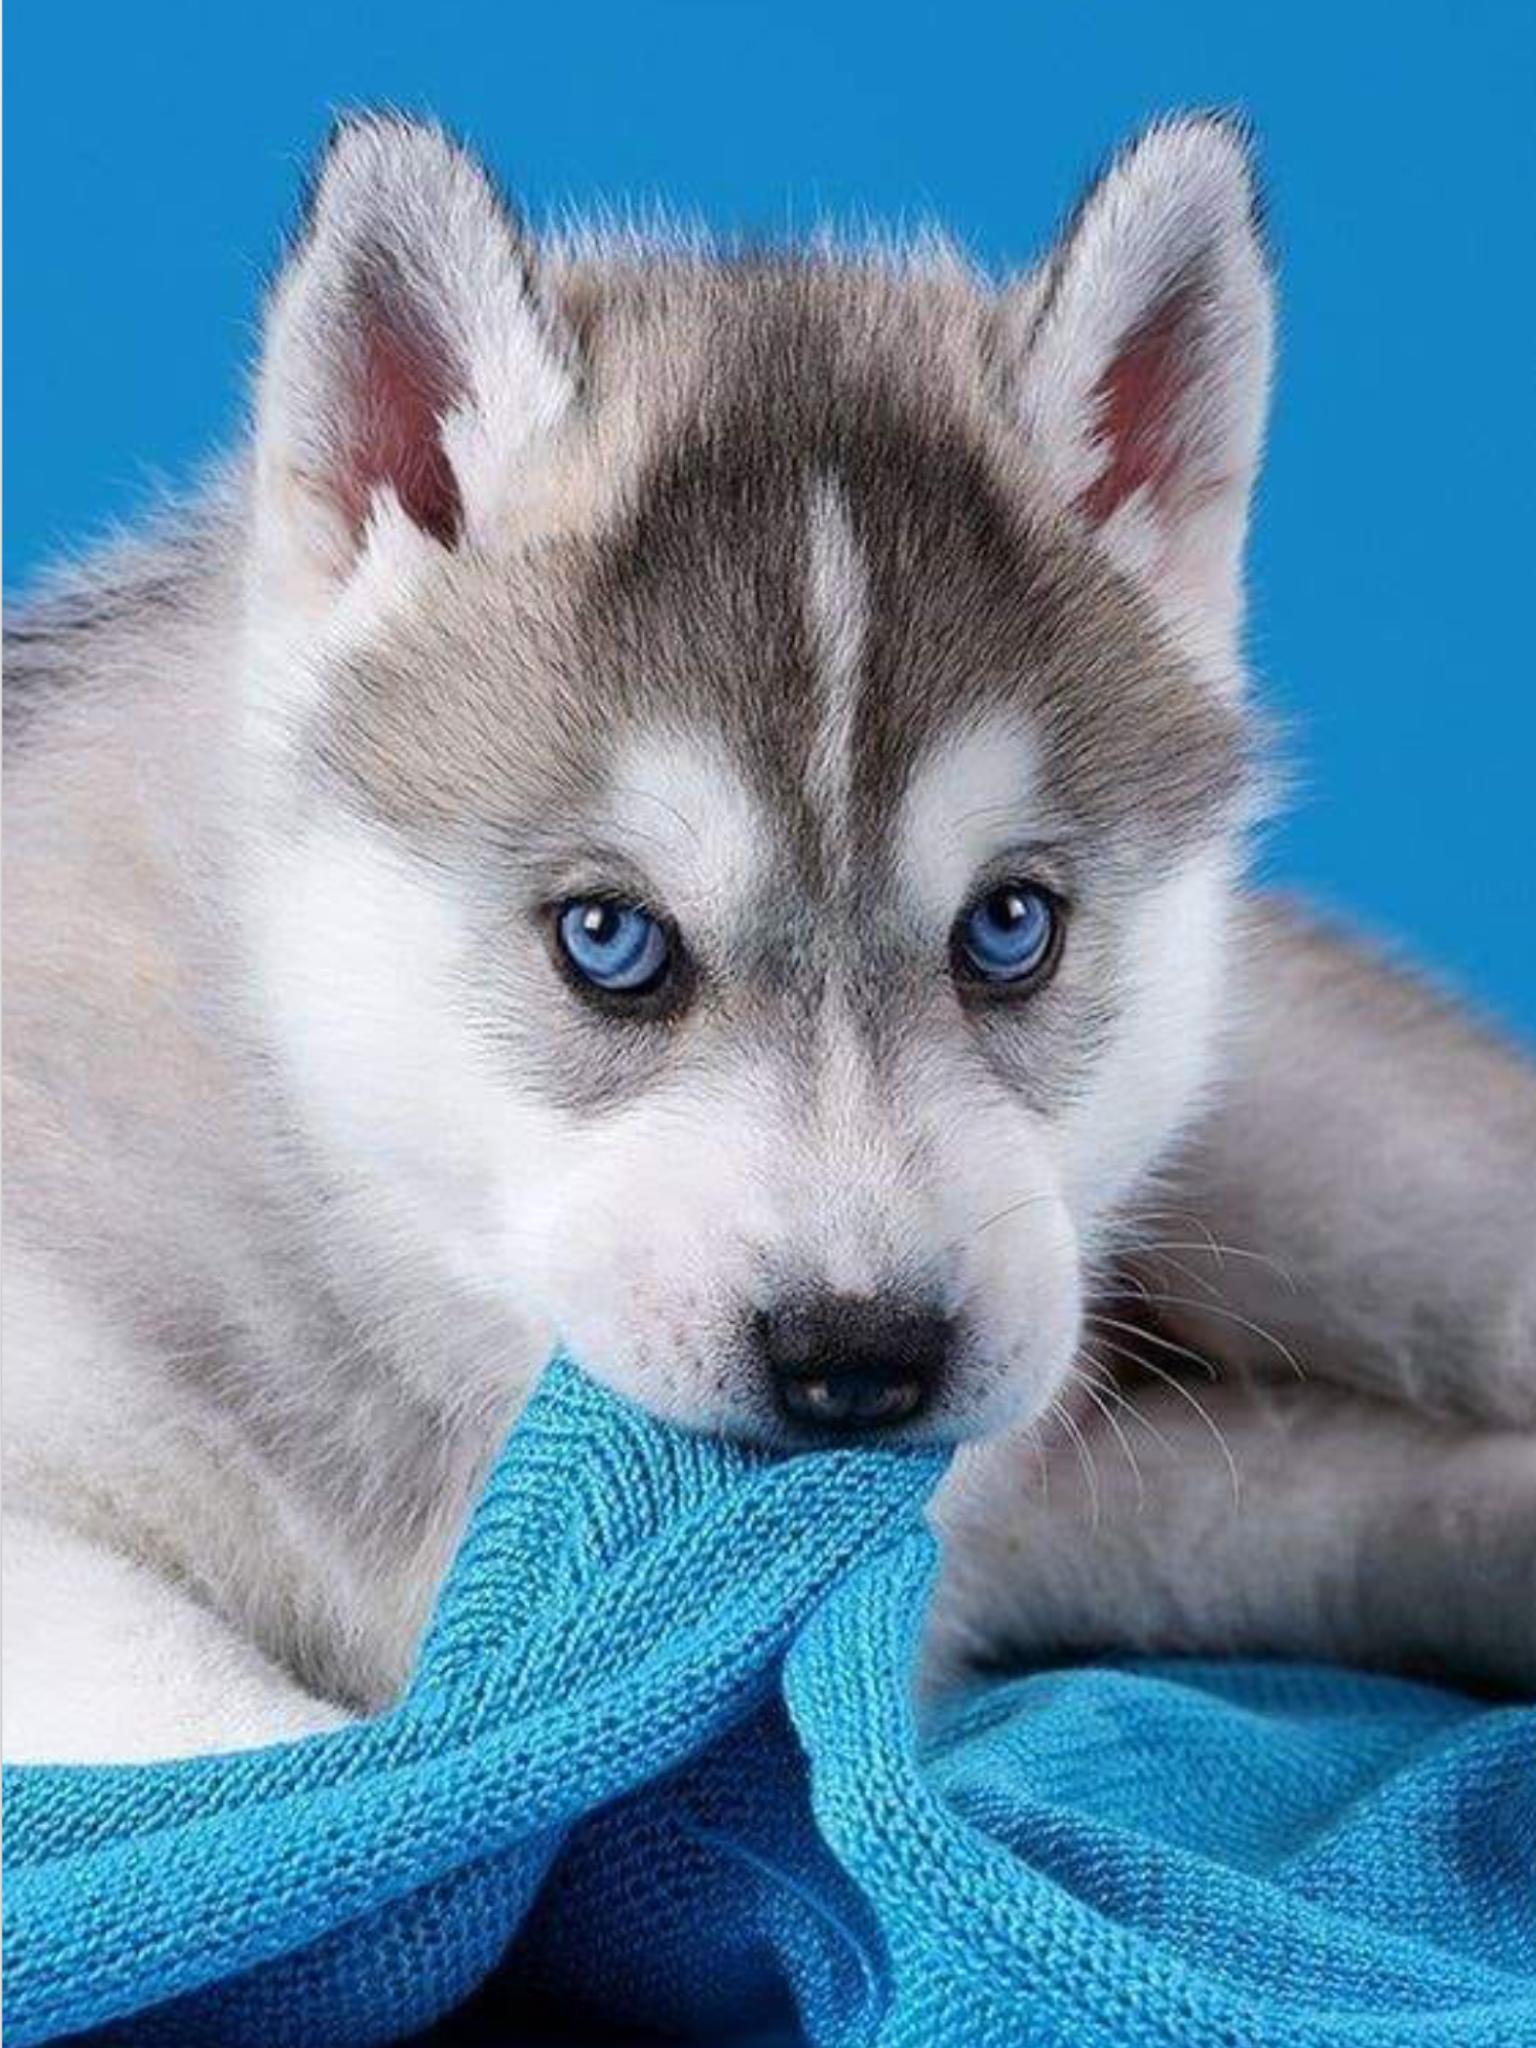 Pin By Kimberly Jo Graue On Too Cute In 2020 Cute Husky Puppies Cute Husky Husky Puppy